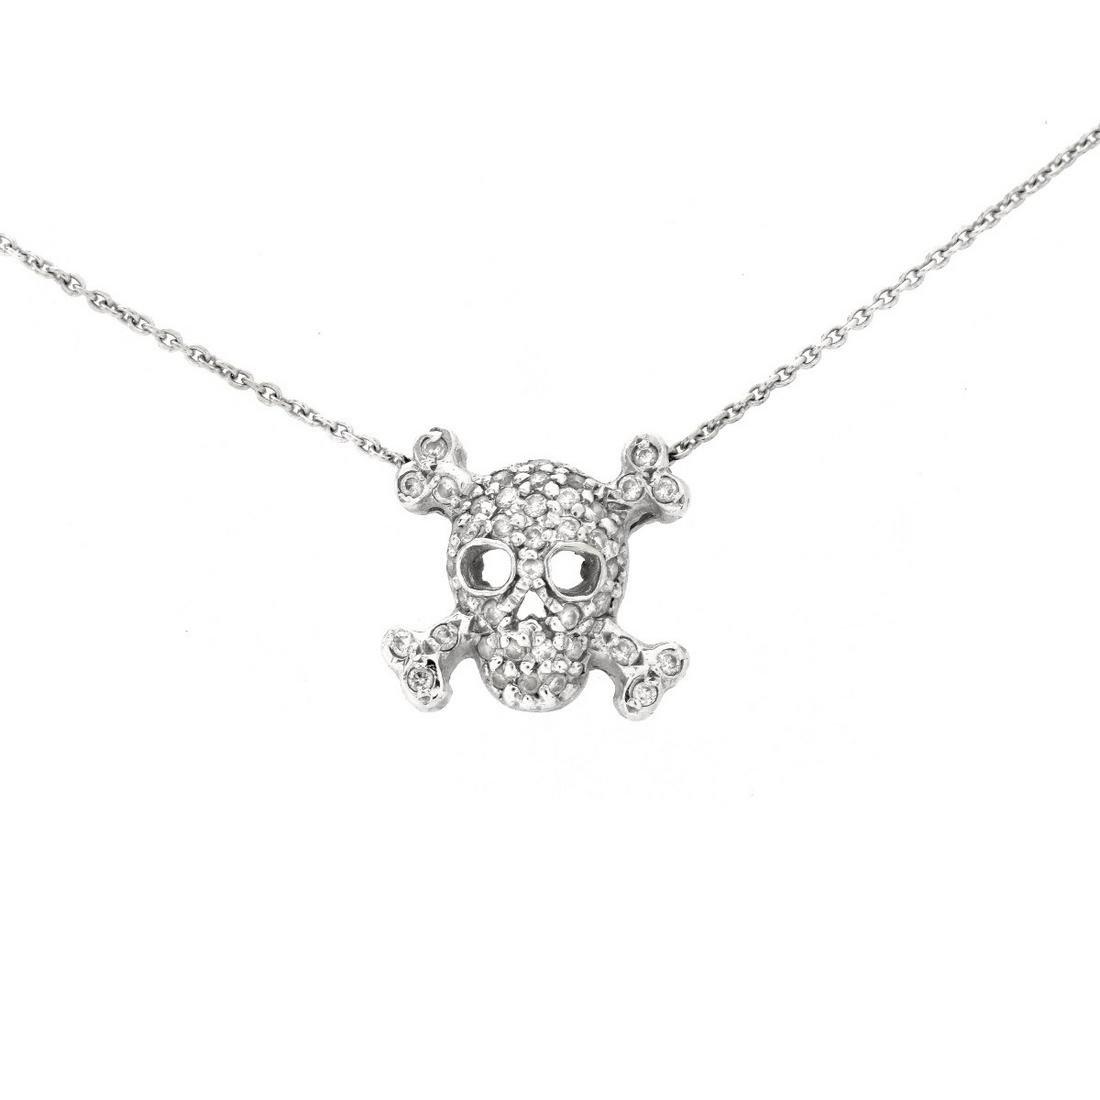 Roberto Coin Diamond and 18K Necklace